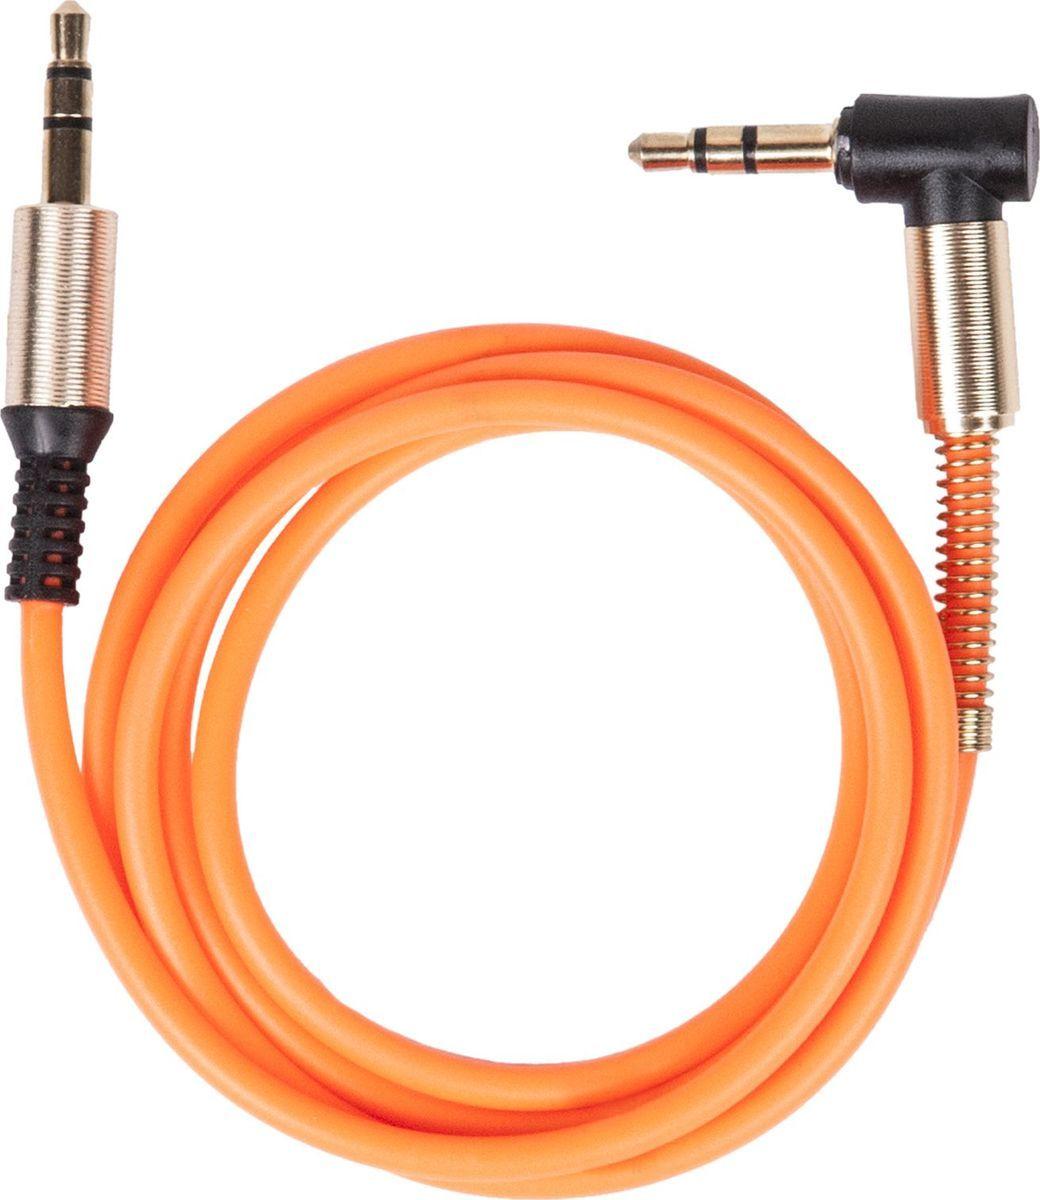 Ritmix RCC-247, Orange кабель Jack 3,5 mm - Jack 3,5 mm угол 90 (1 м)